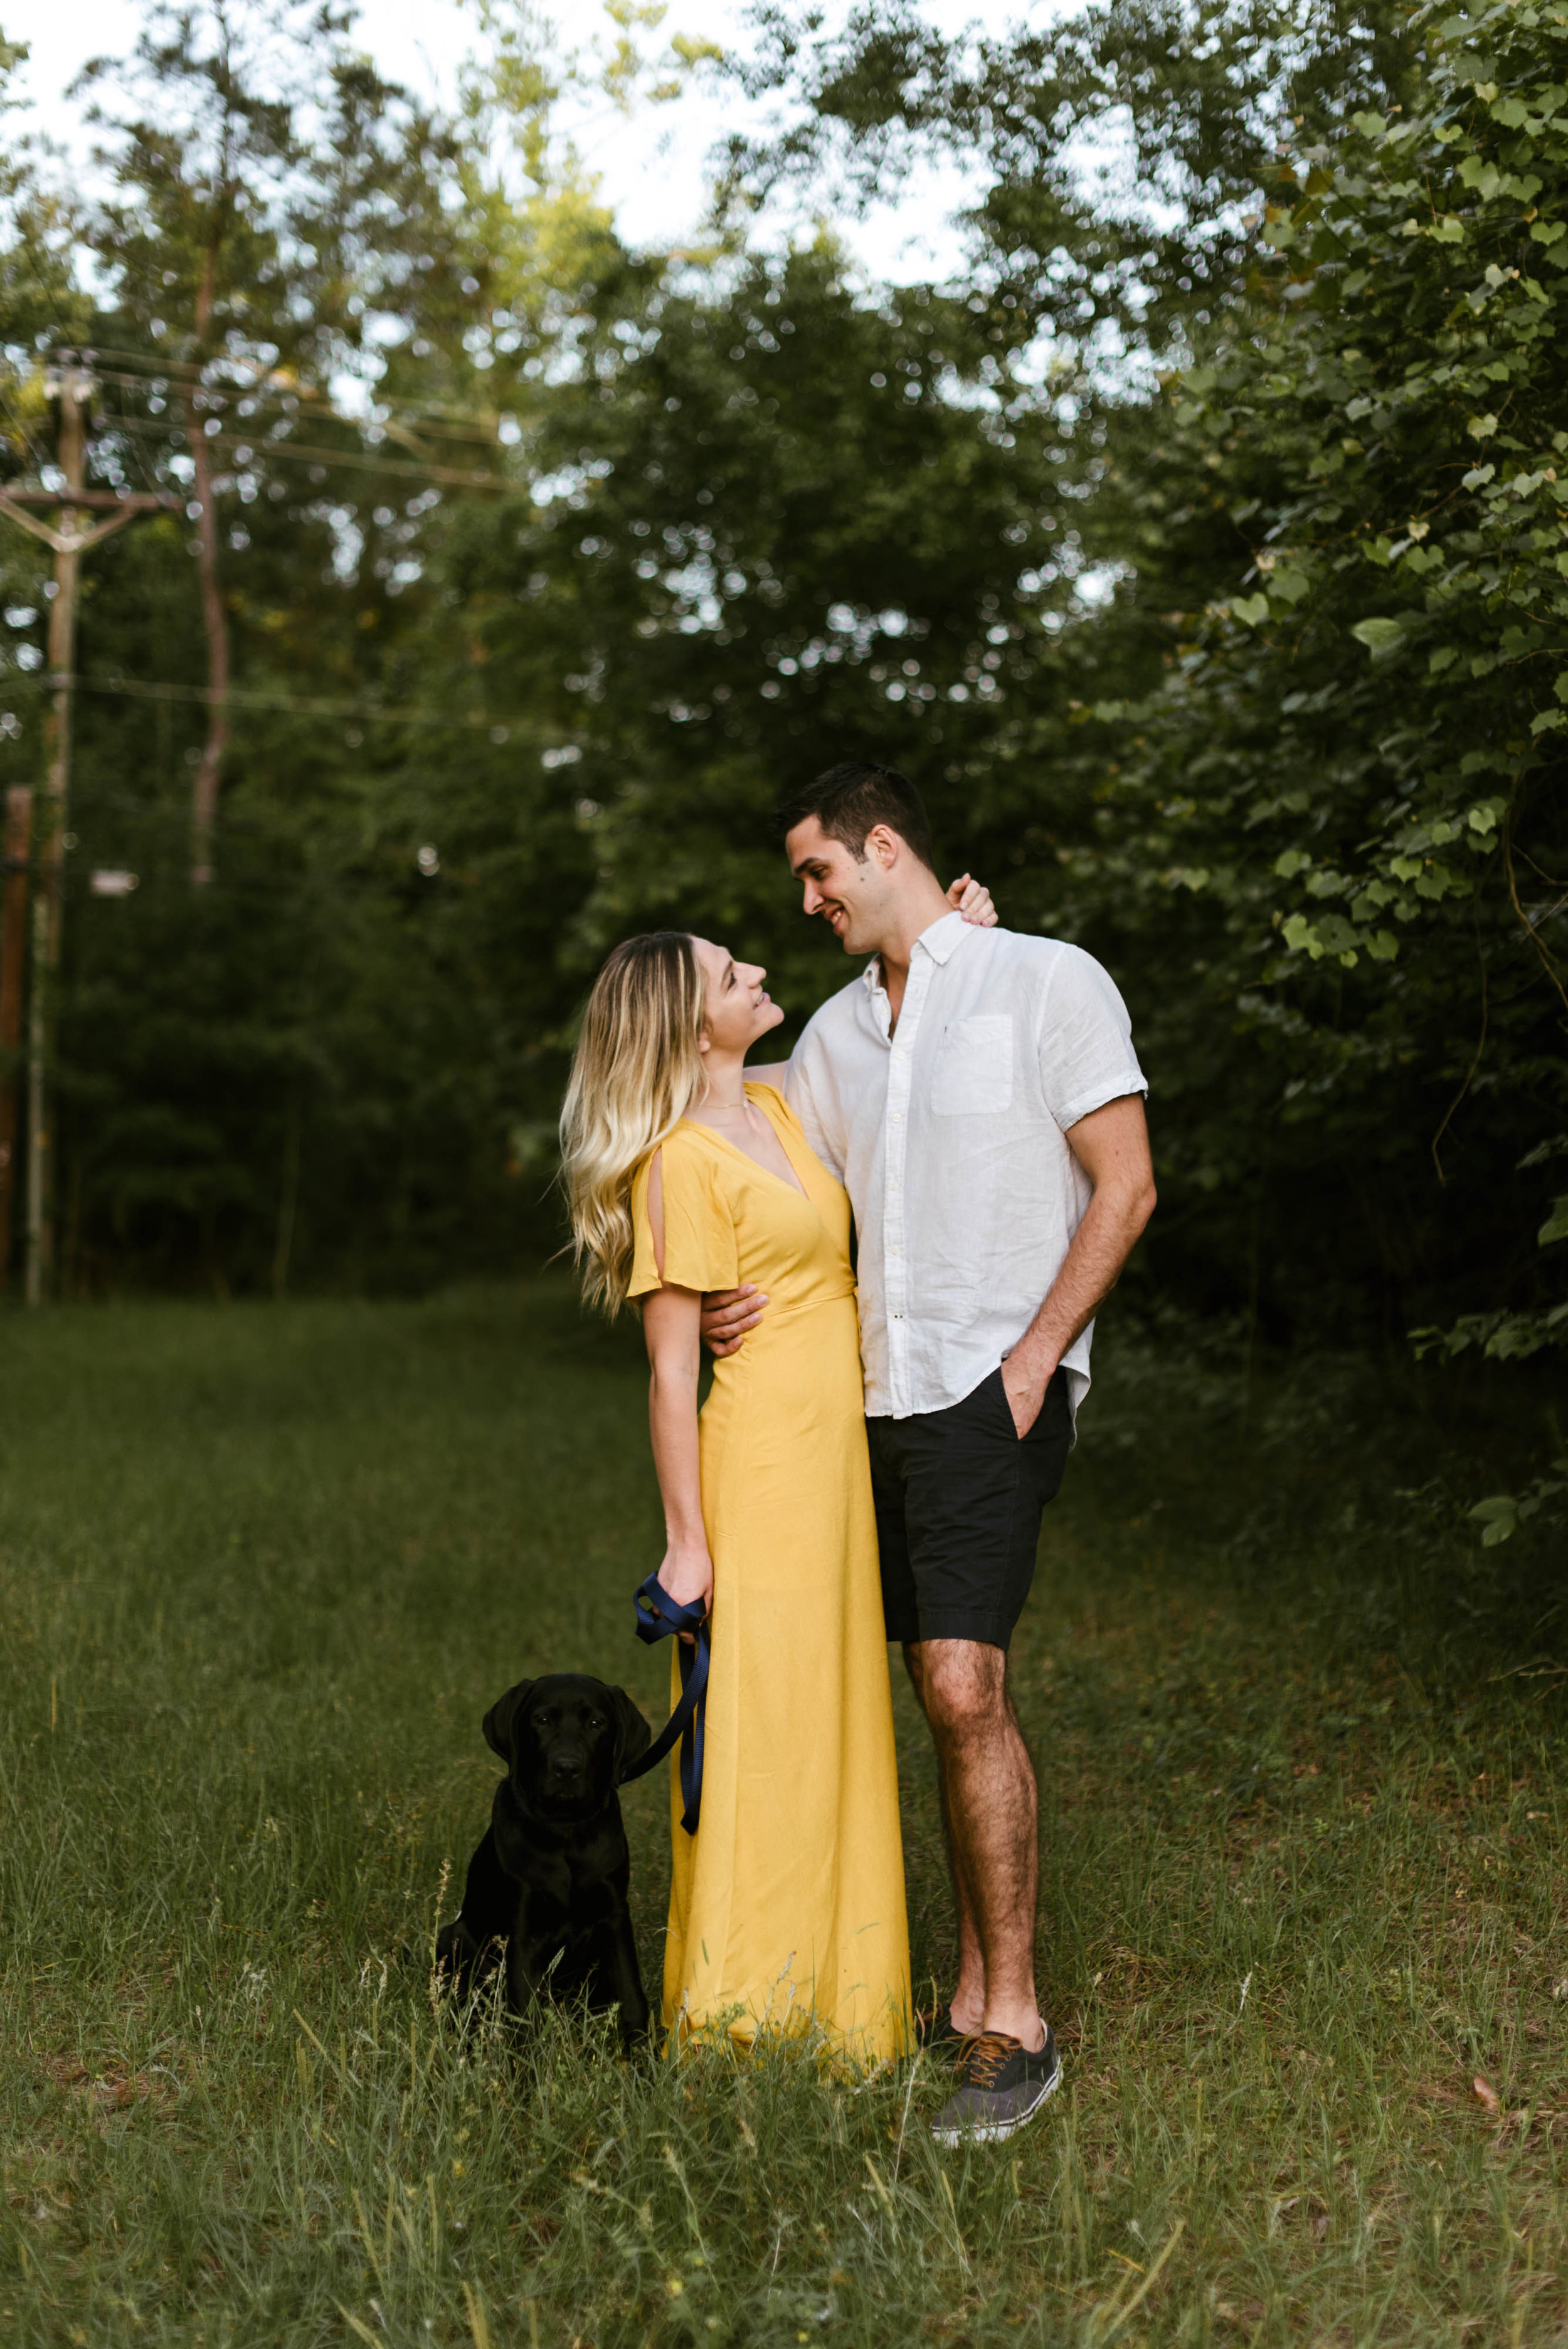 Fort Worth Photographer | Fort Worth Engagement Photographer | DFW Photographer